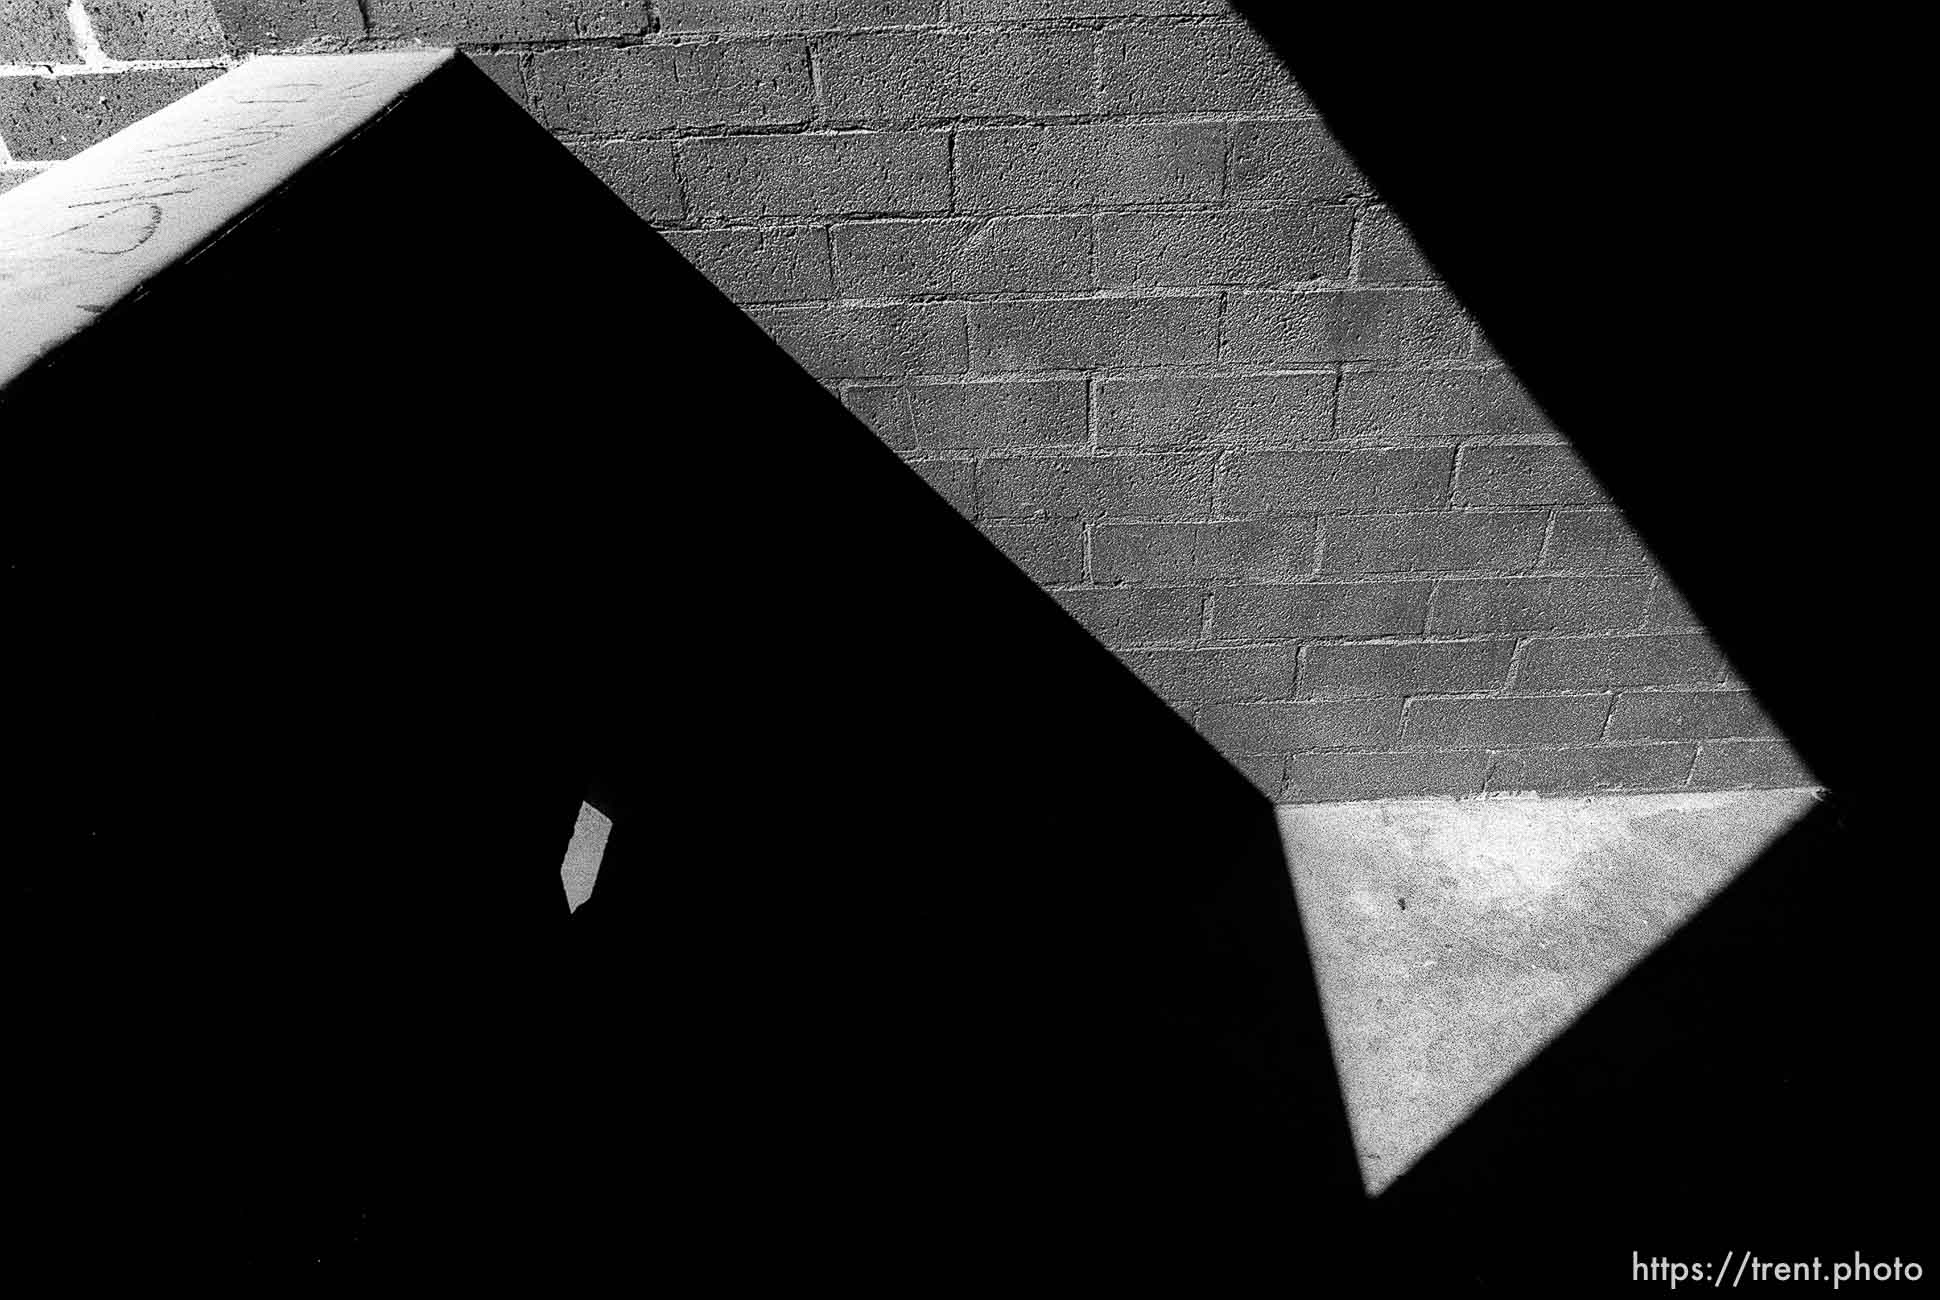 Brick and shadows and light